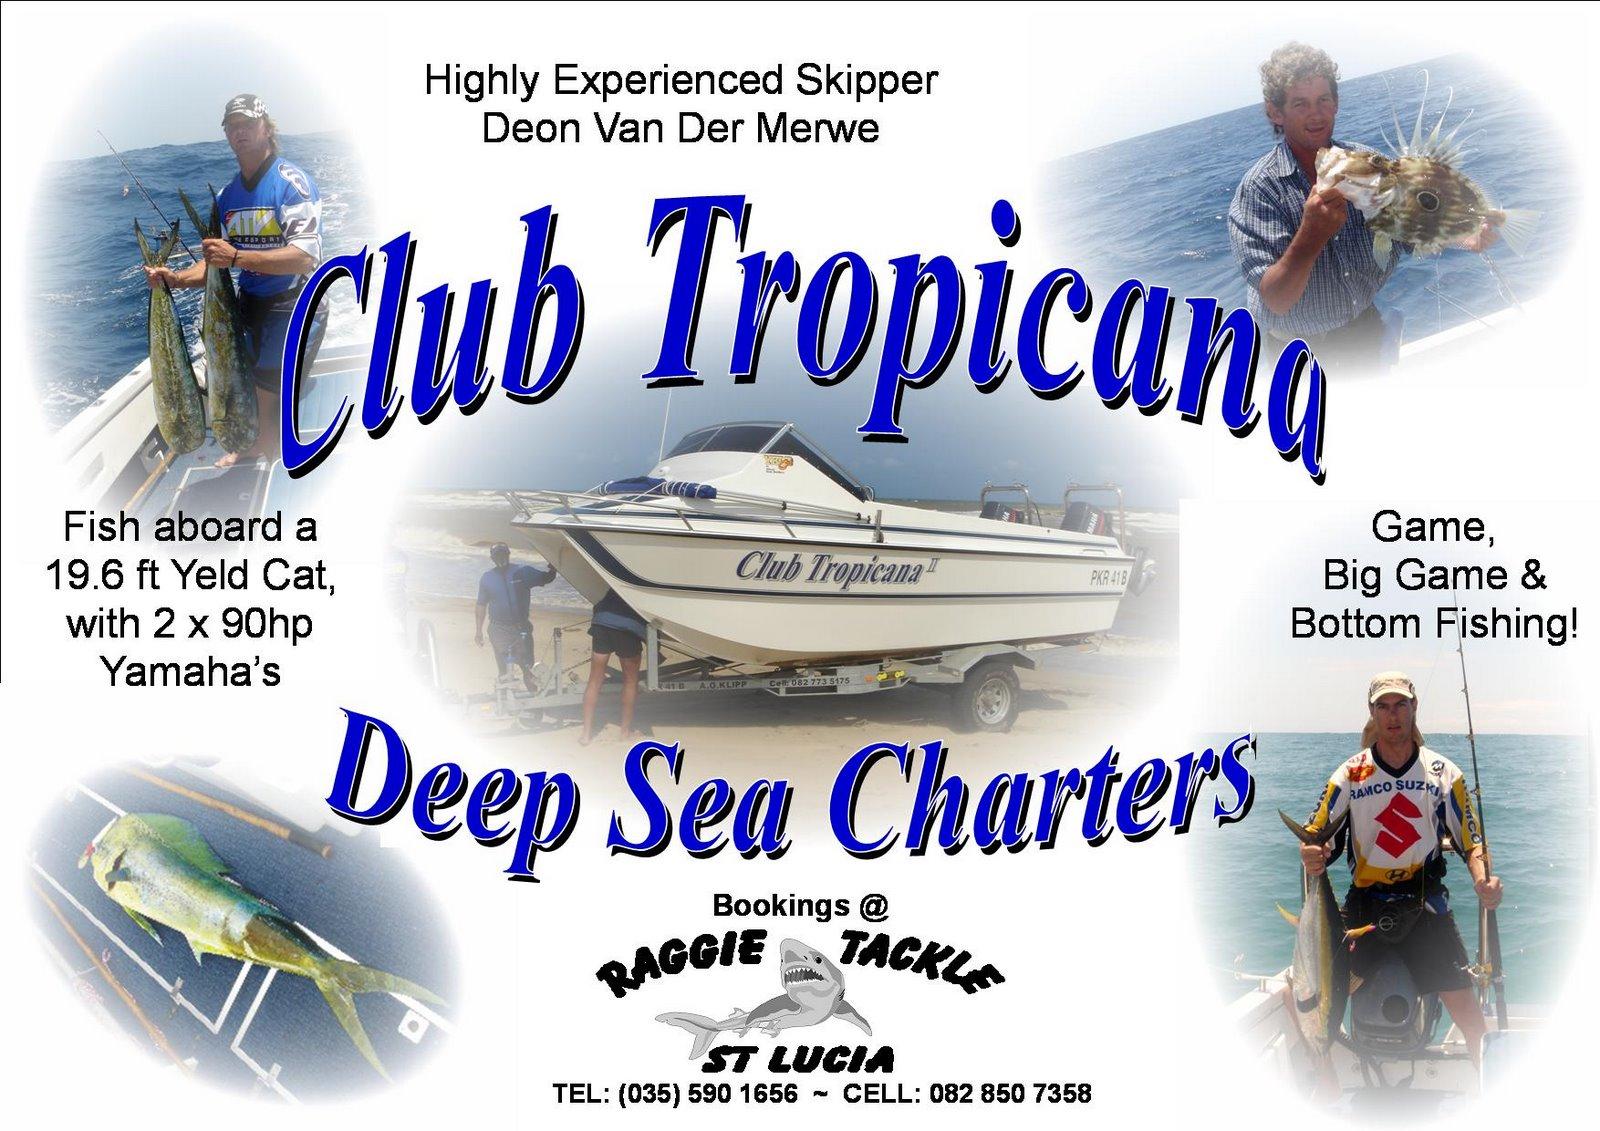 Raggie tackle st lucia deep sea fishing charters st lucia for Deep sea fishing st lucia